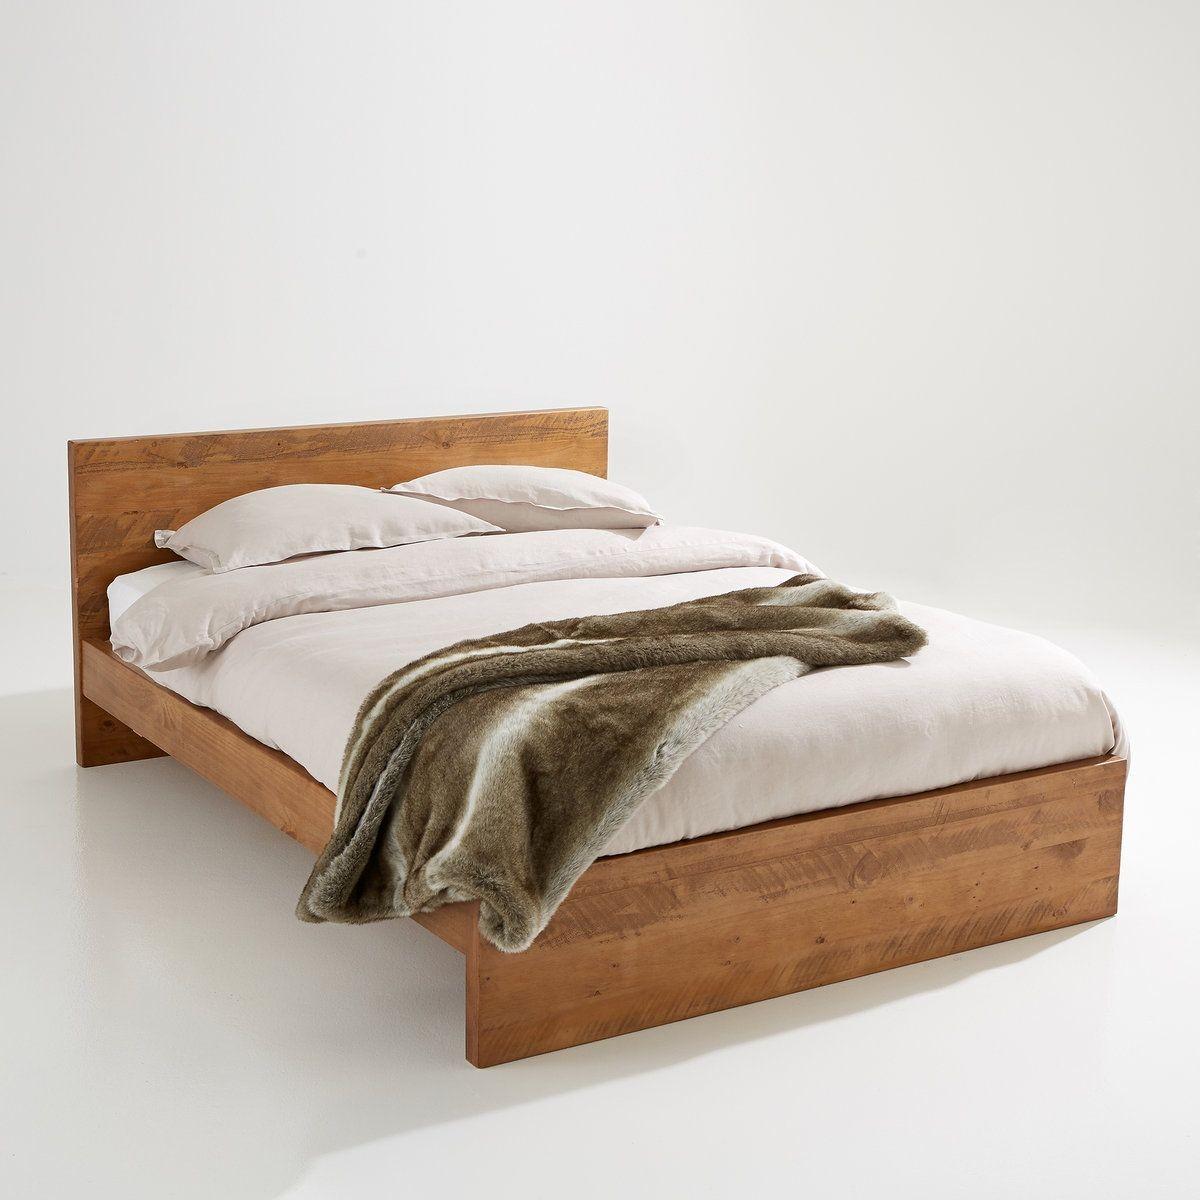 Lit pin massif brossé, Lunja Pine beds, Bed, Pine bed frame